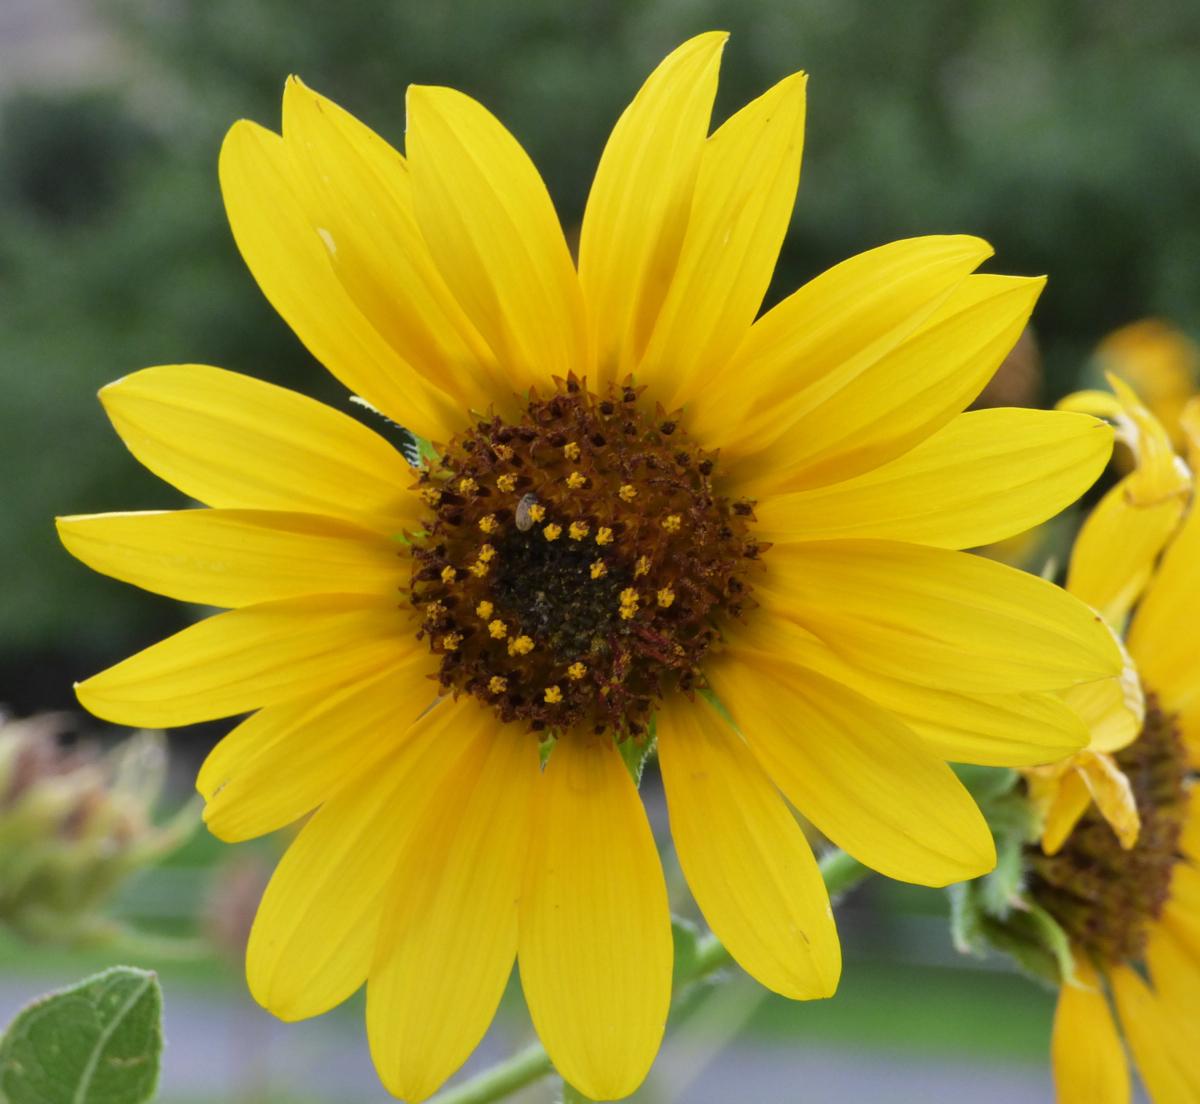 sunflower P1000031.jpg